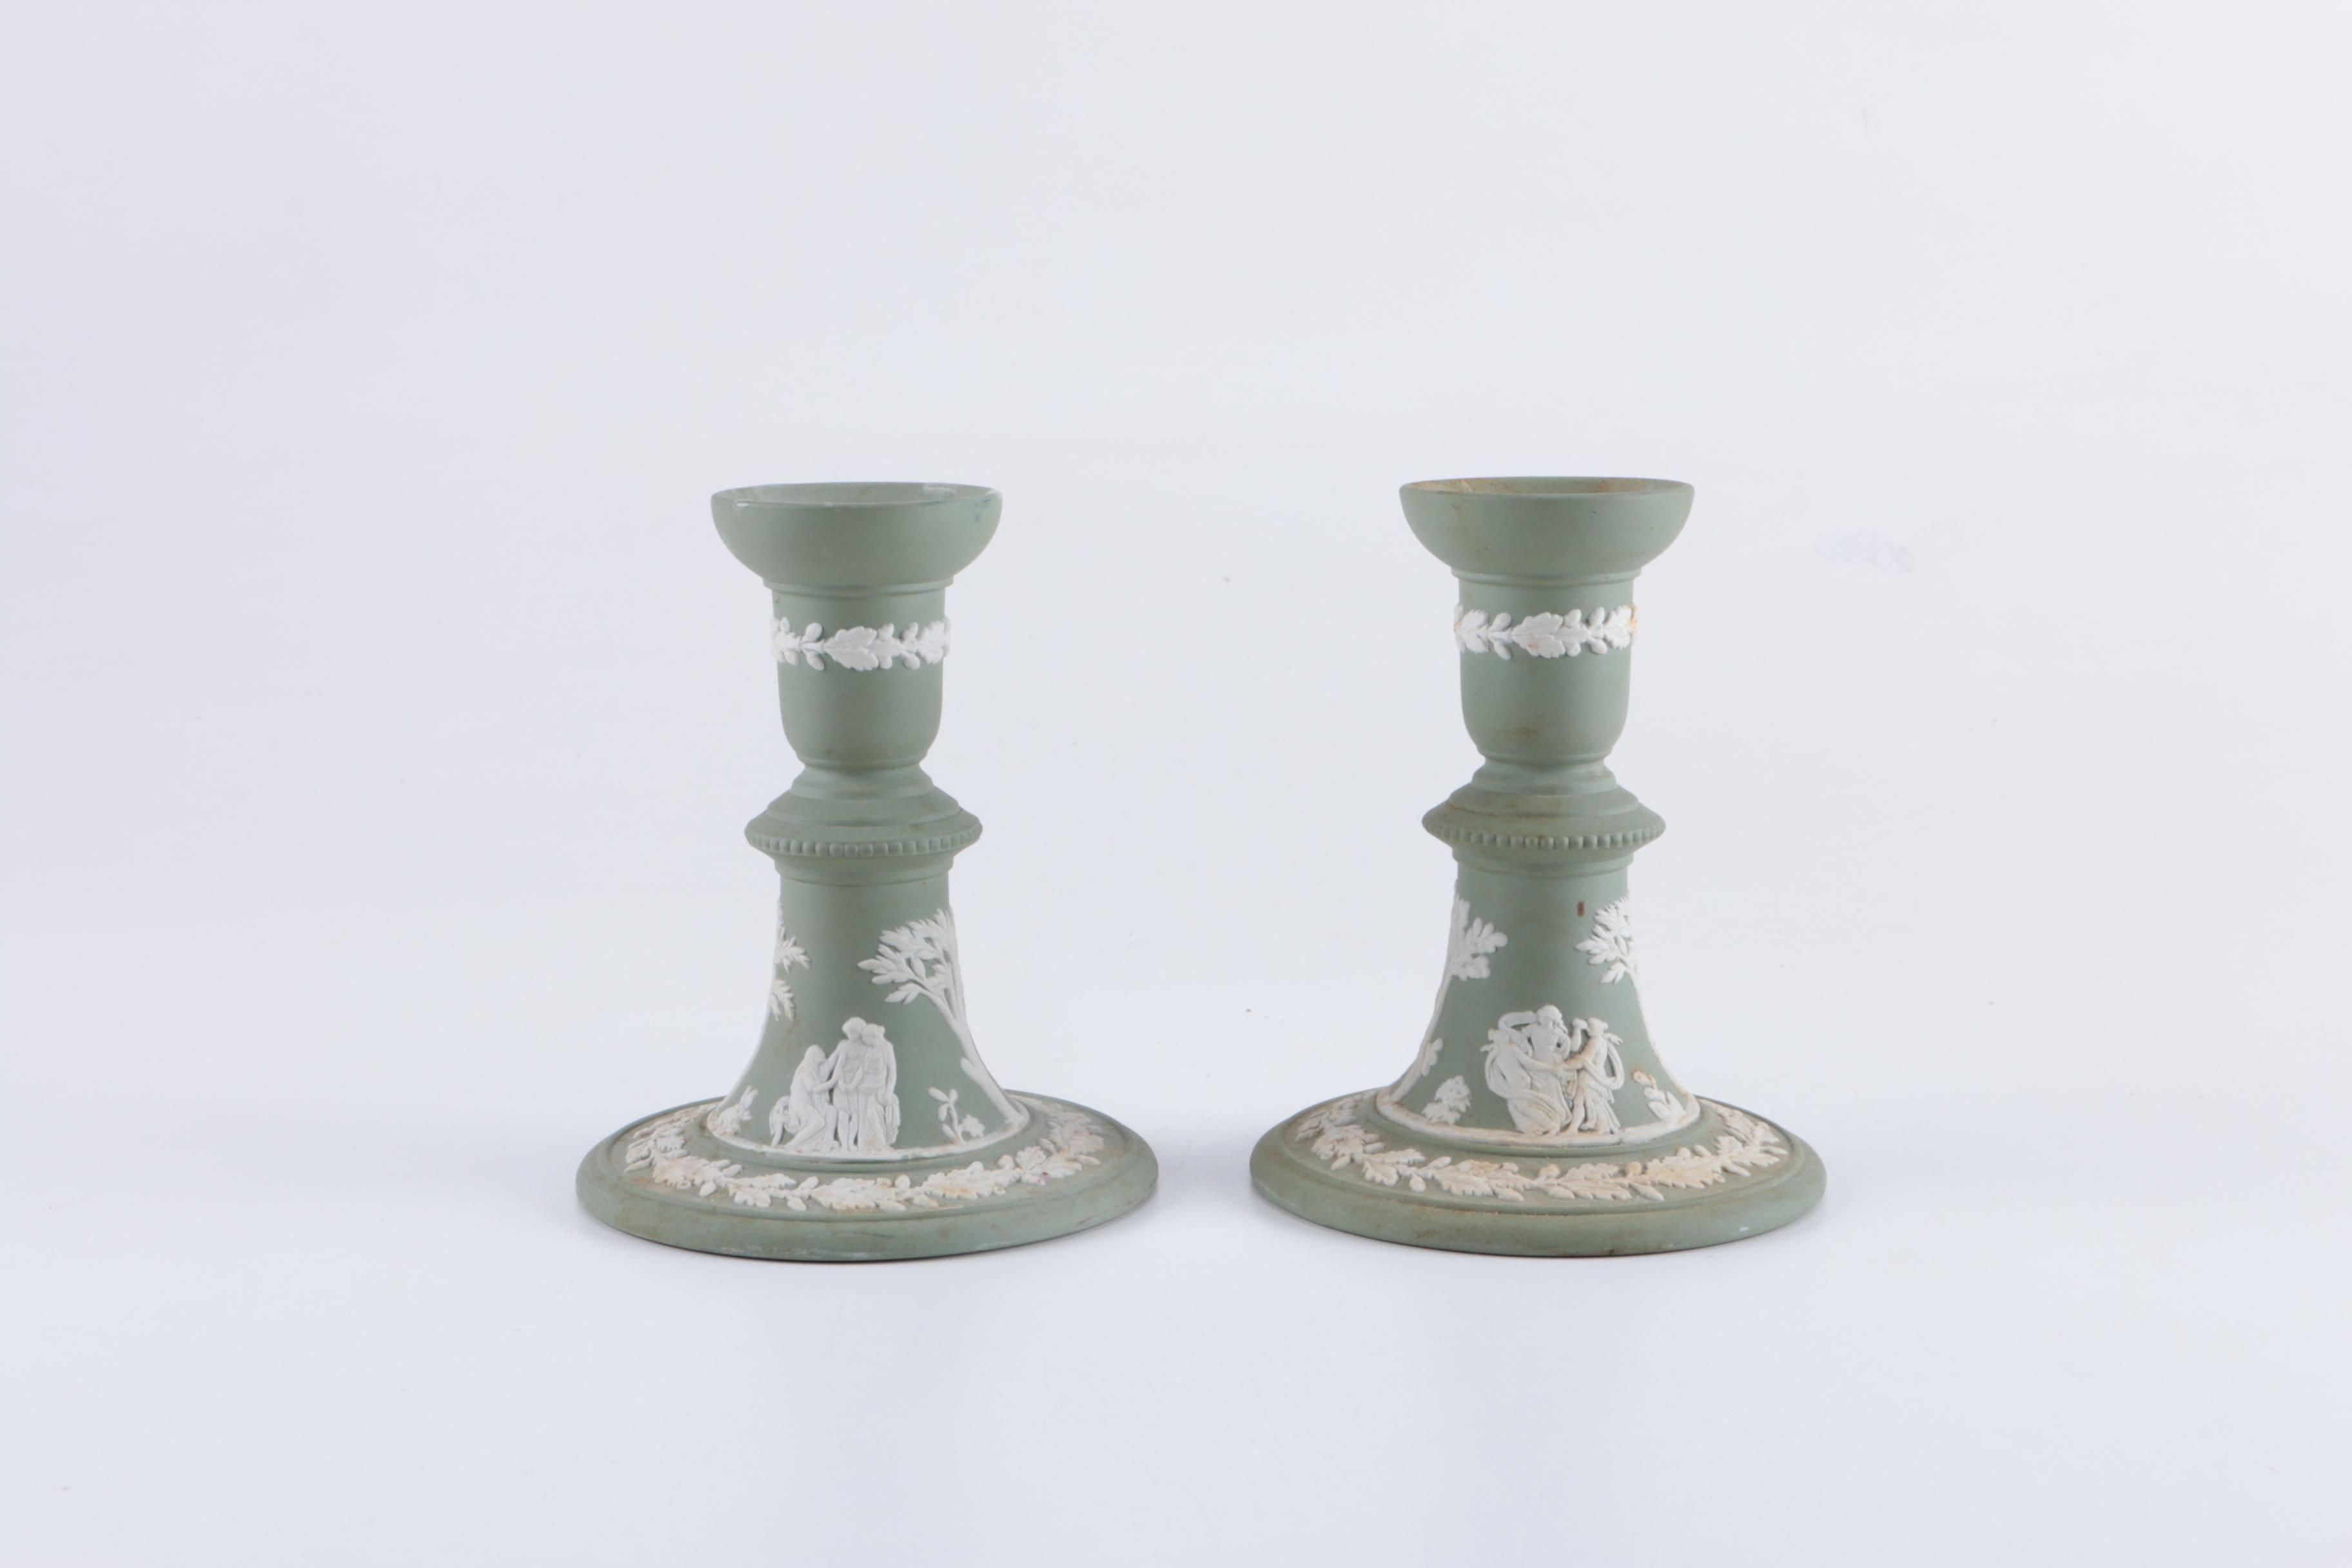 Pair of Wedgwood Jasperware Candlestick Holders